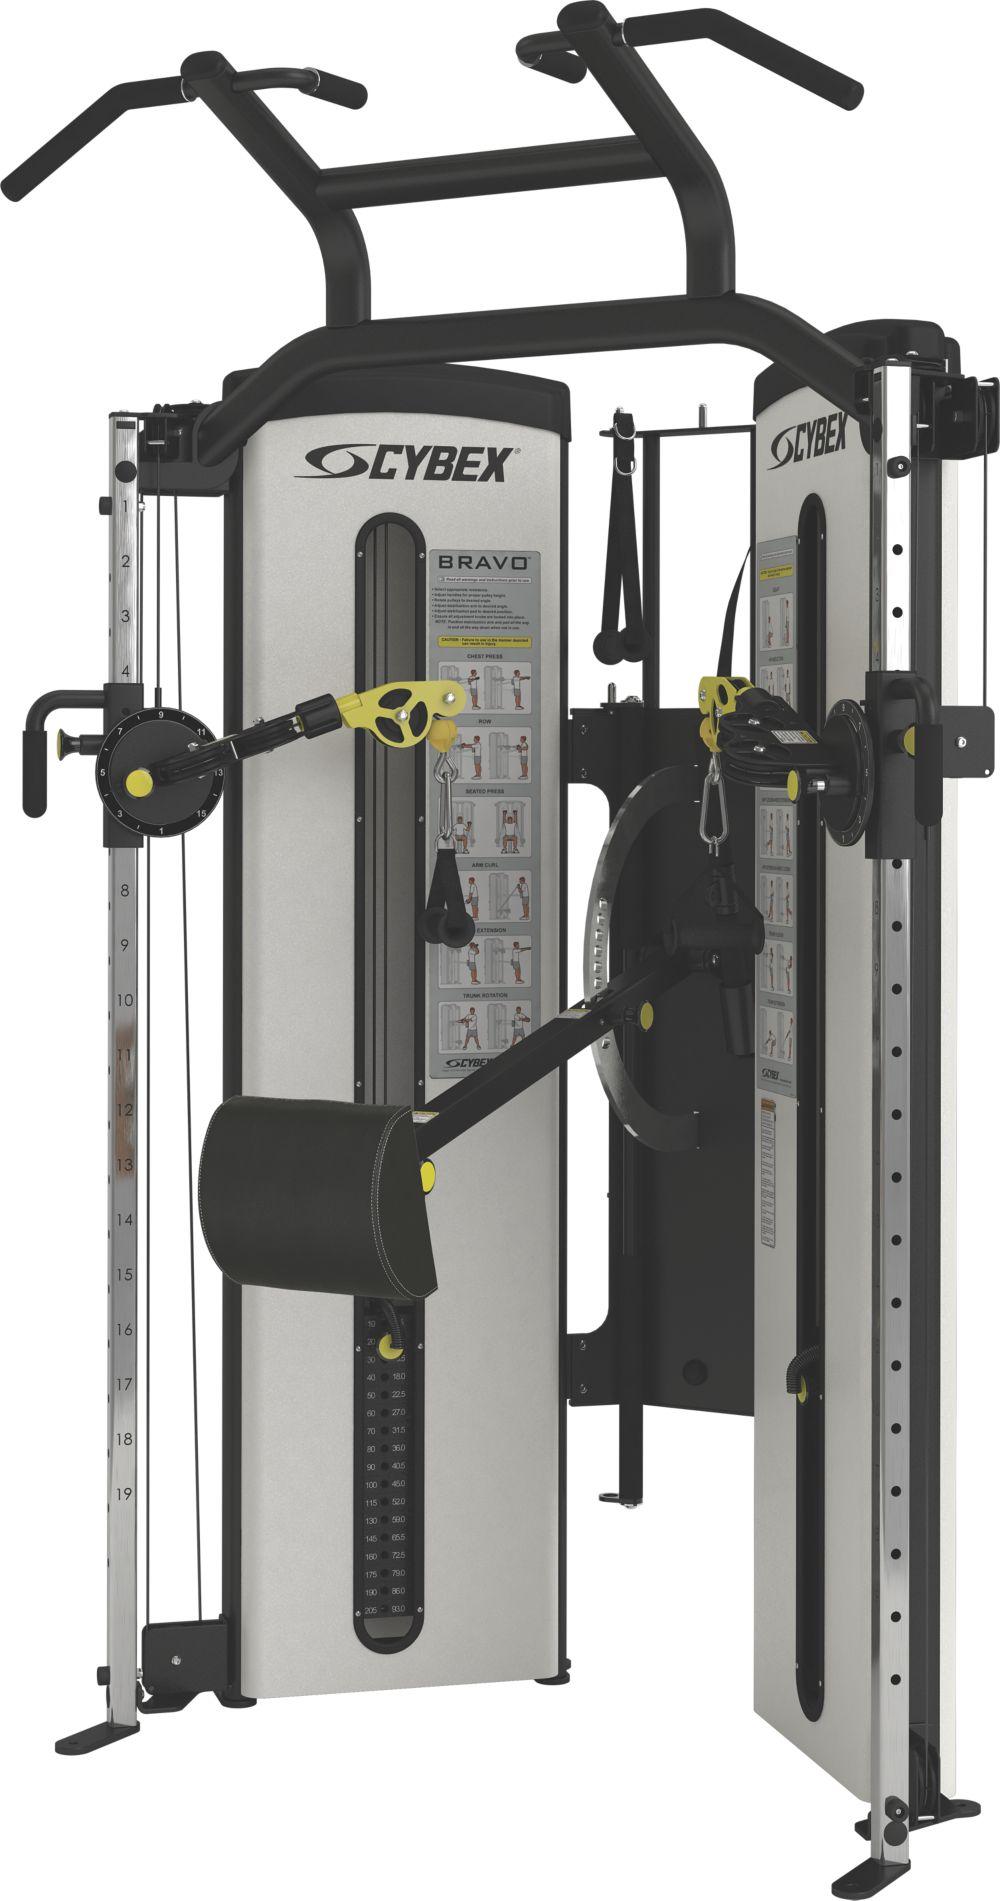 cybex cable machine